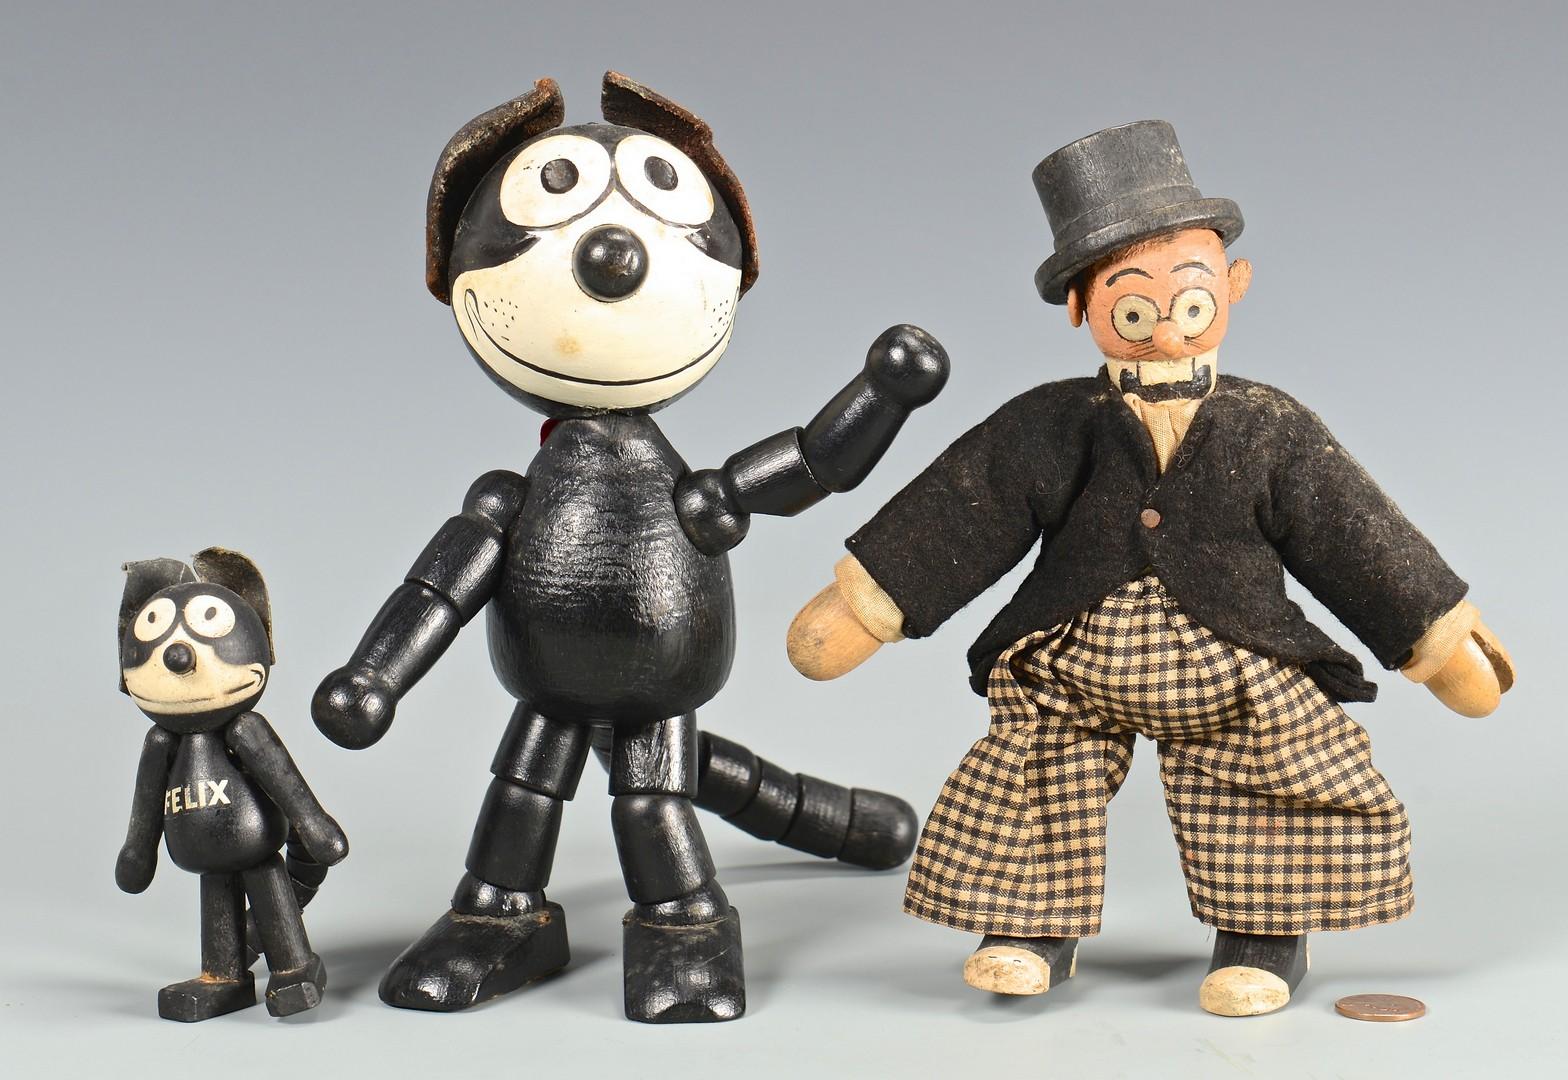 Lot 582: Group of Schoenhut Wooden Doll Figures, 3 total